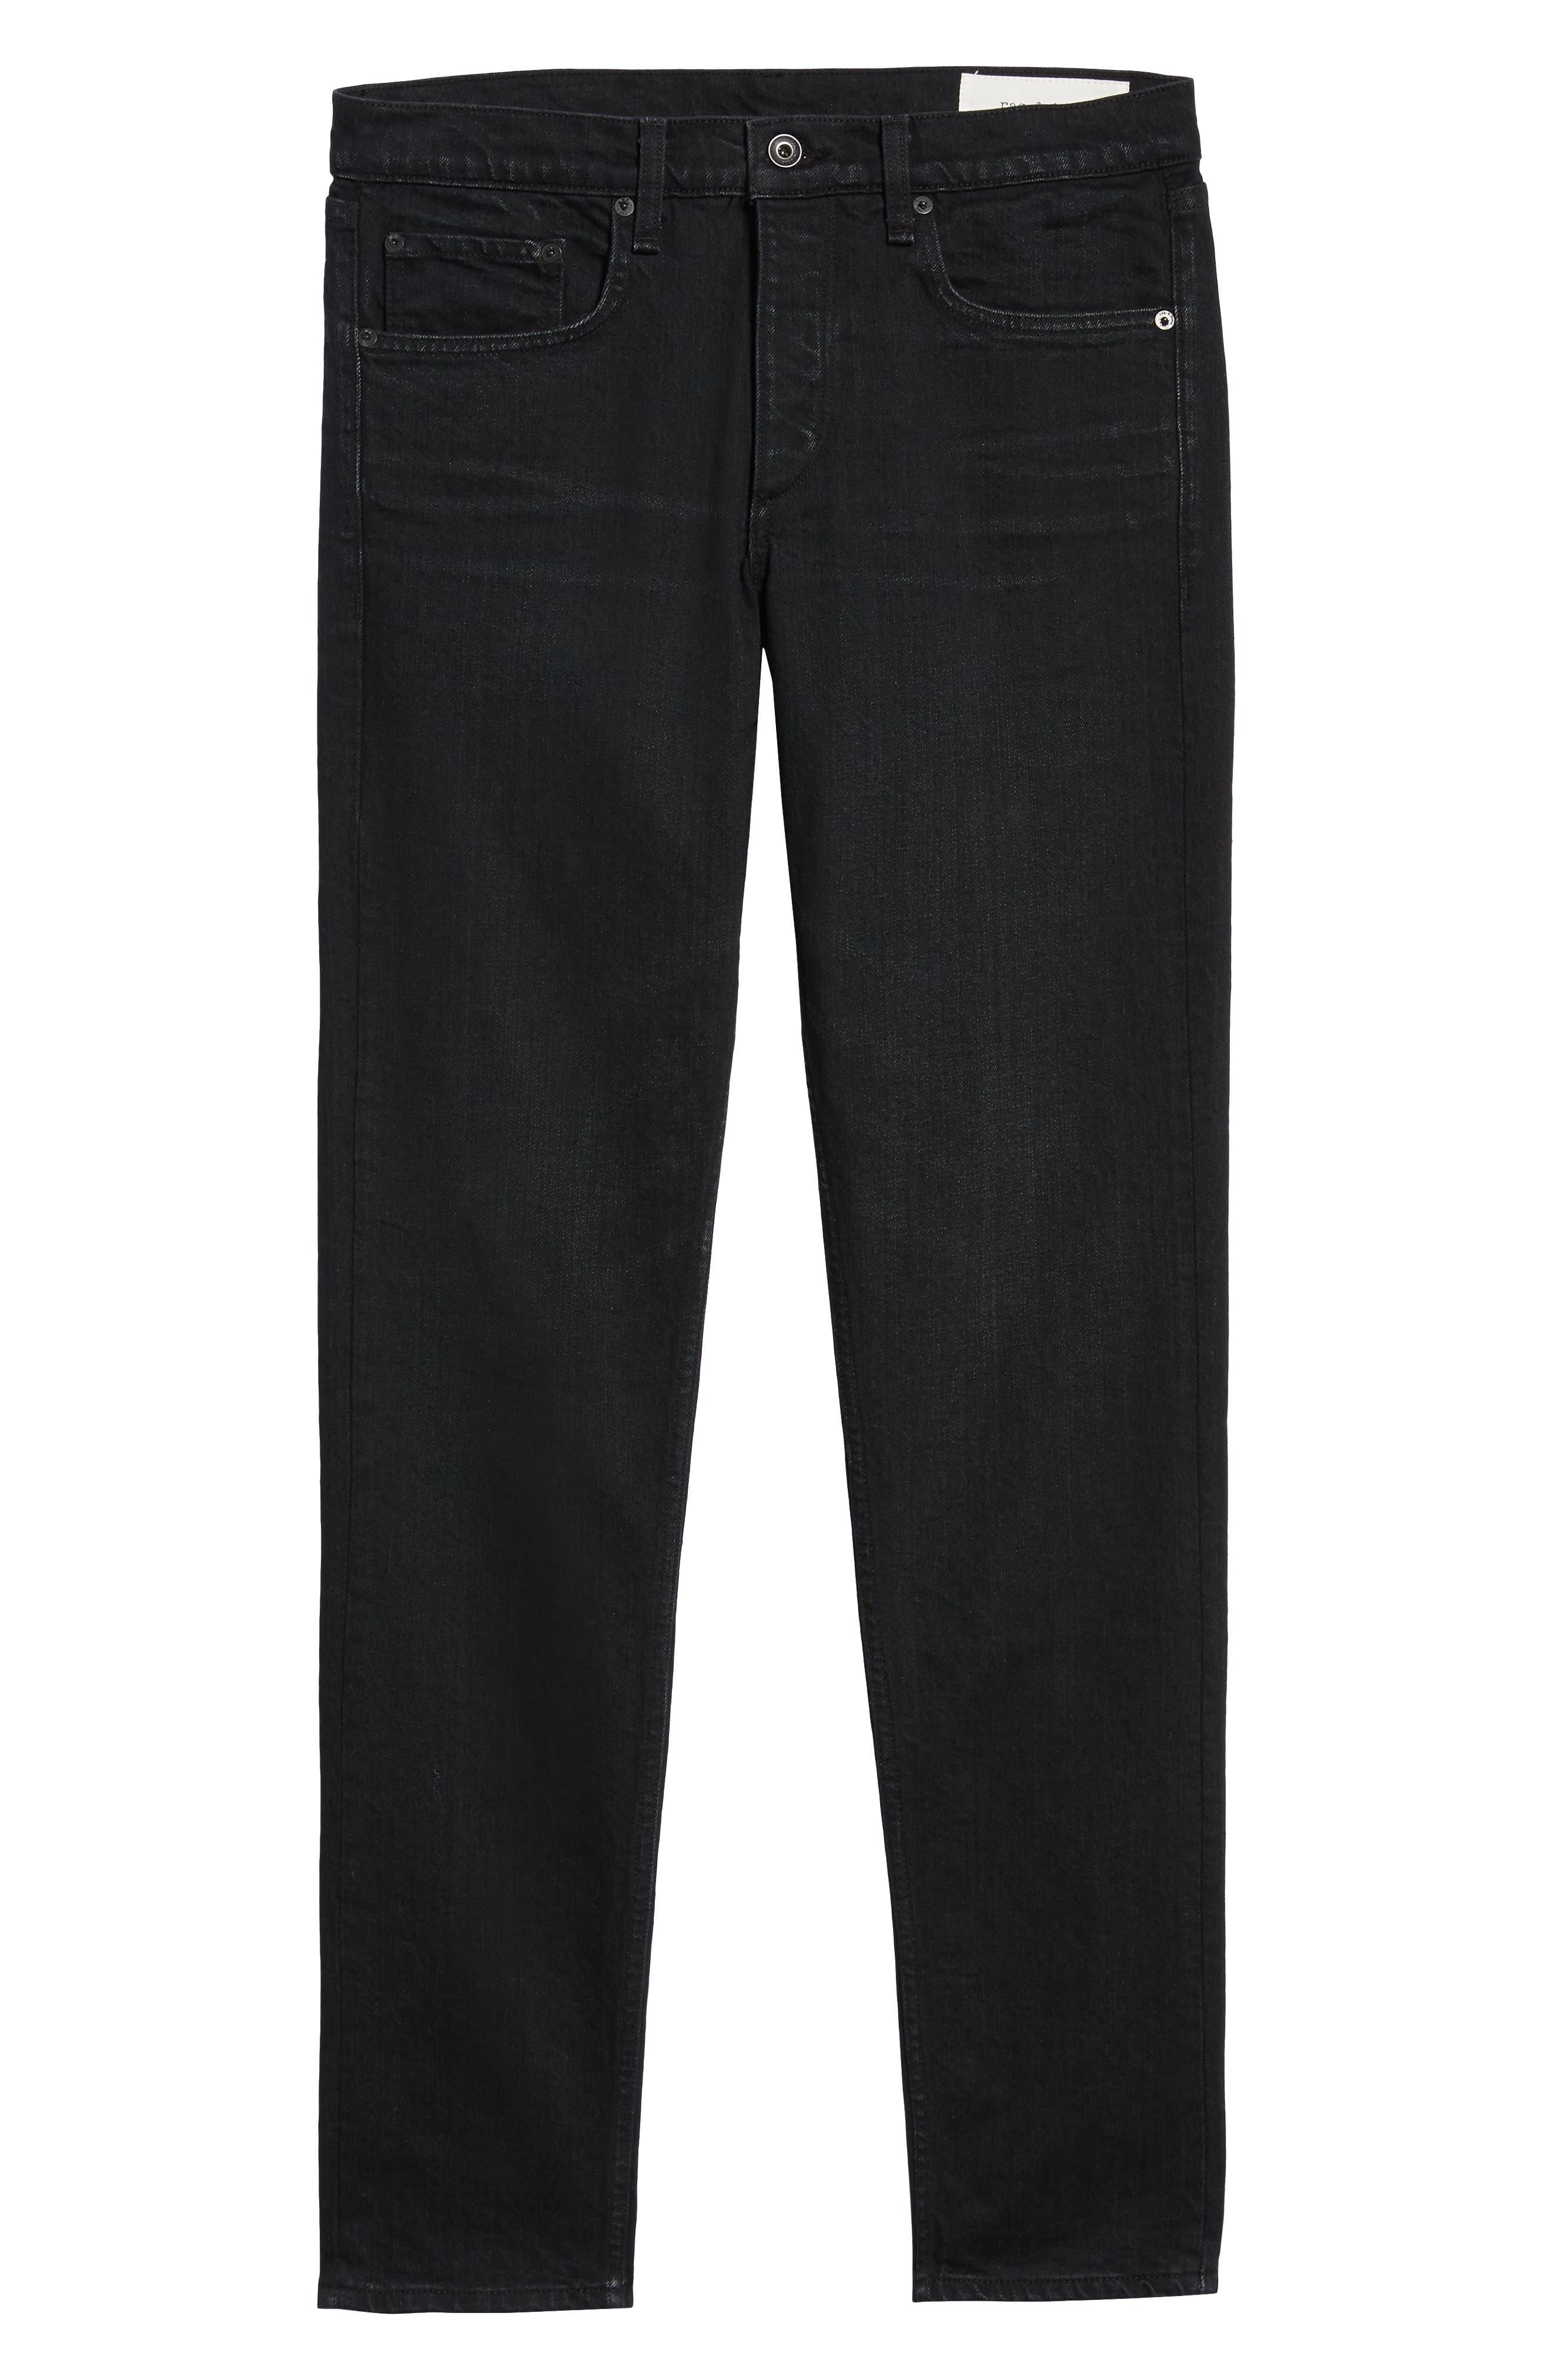 Fit 1 Skinny Fit Jeans,                             Alternate thumbnail 6, color,                             DEVON